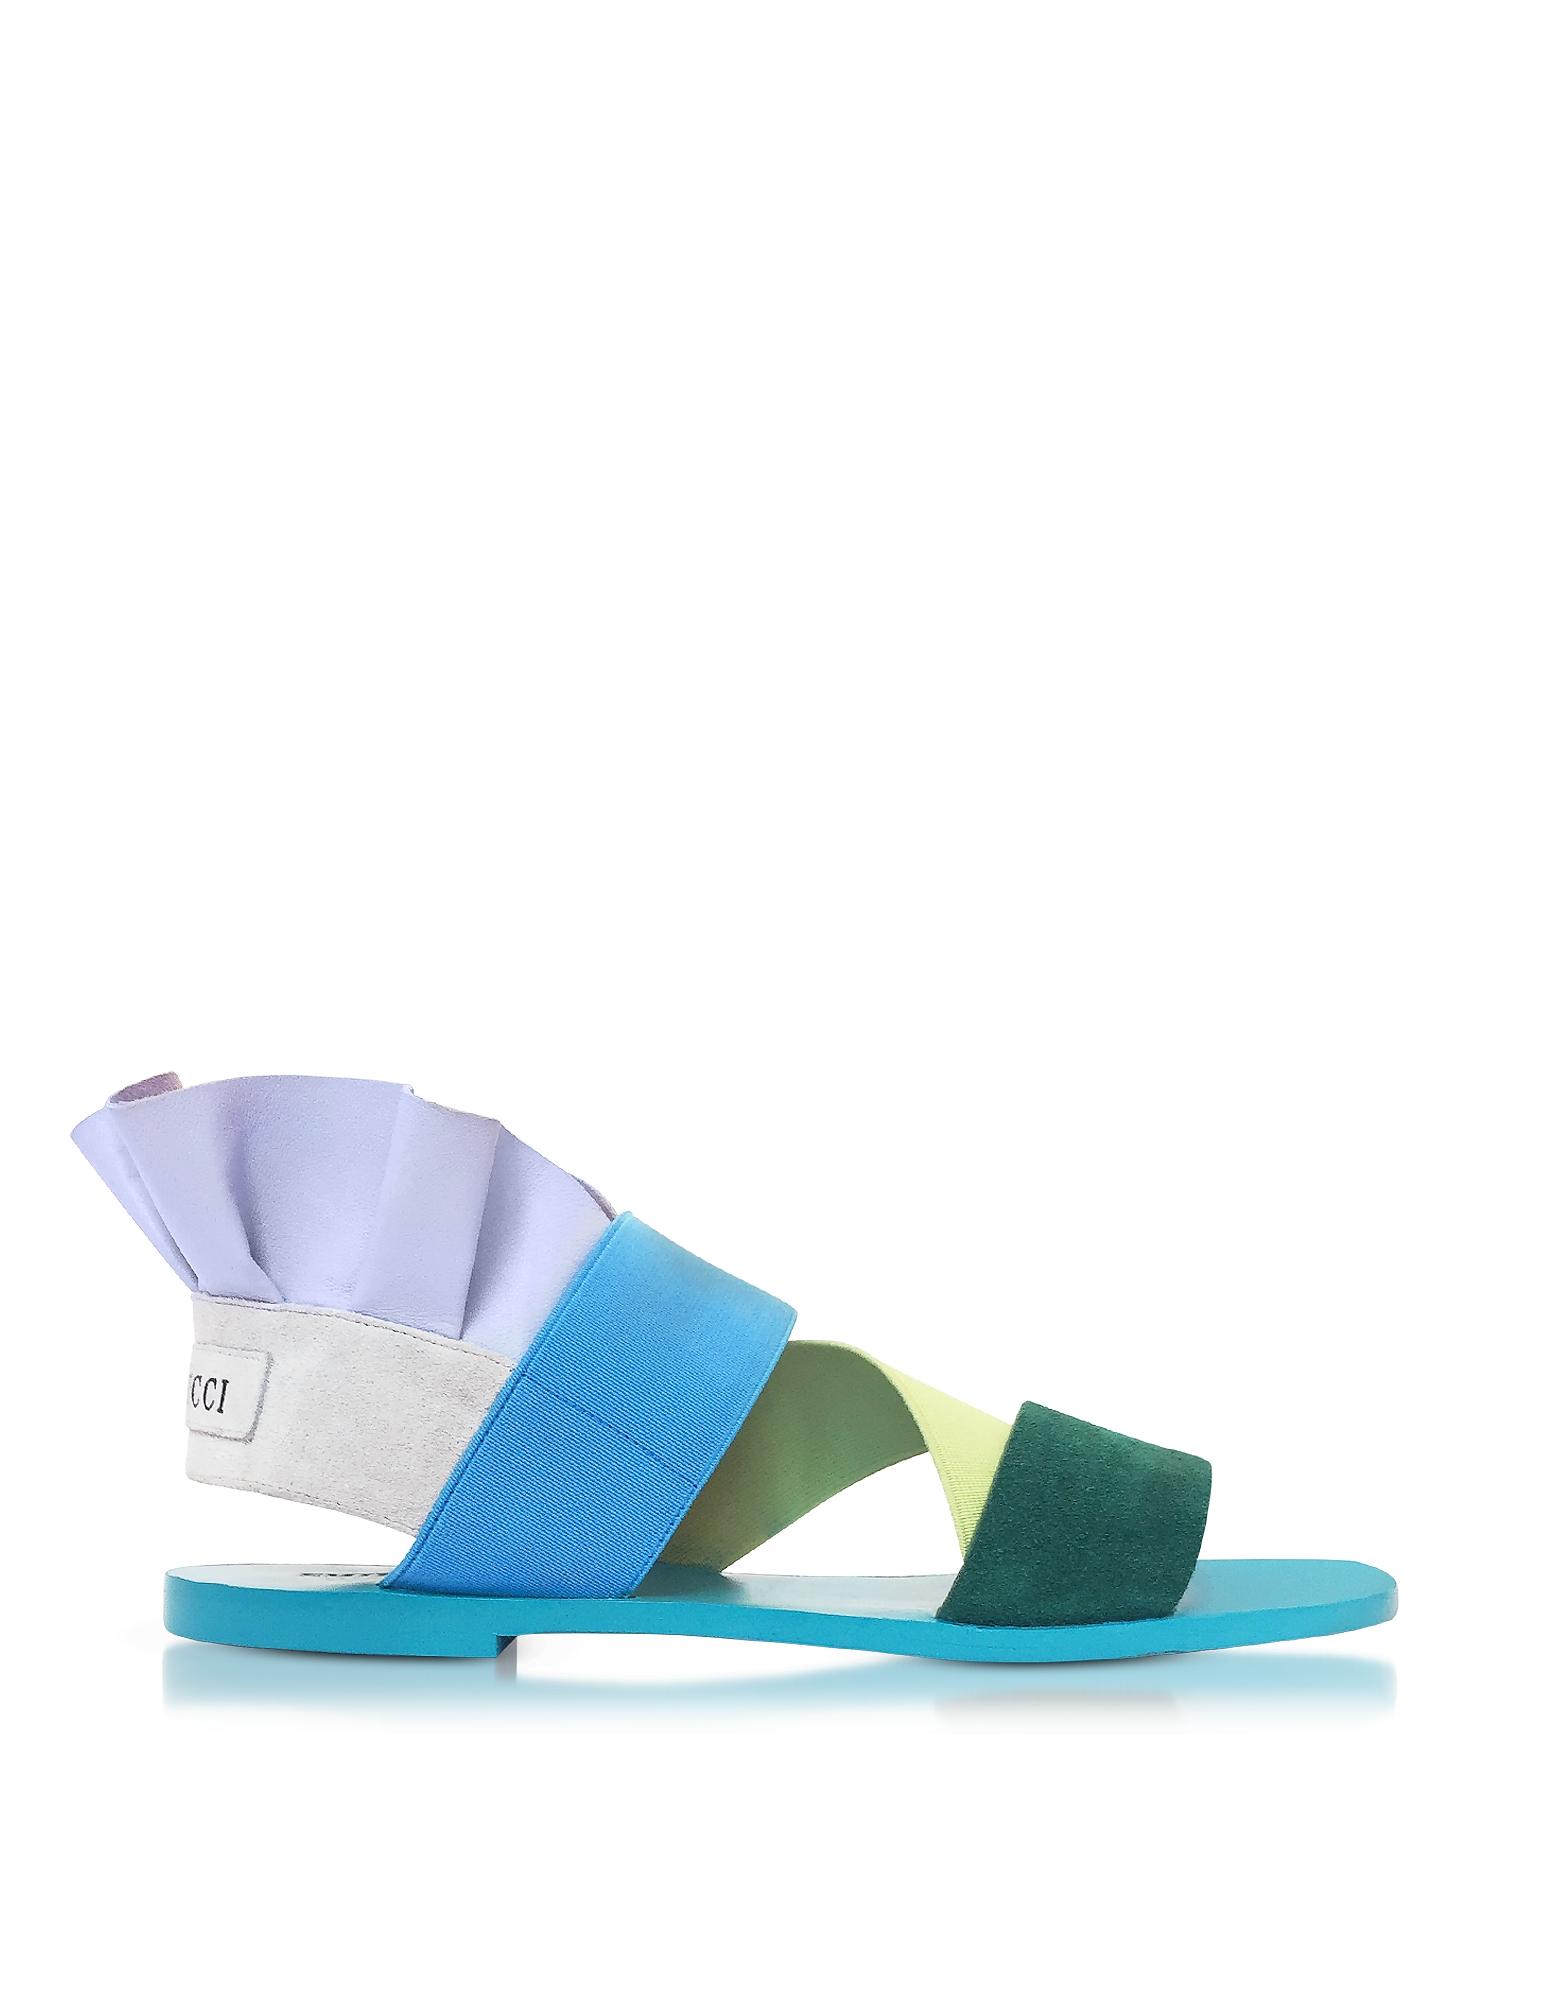 Emilio Pucci Shoes, Elastan and Suede Color Block Flat Sandals